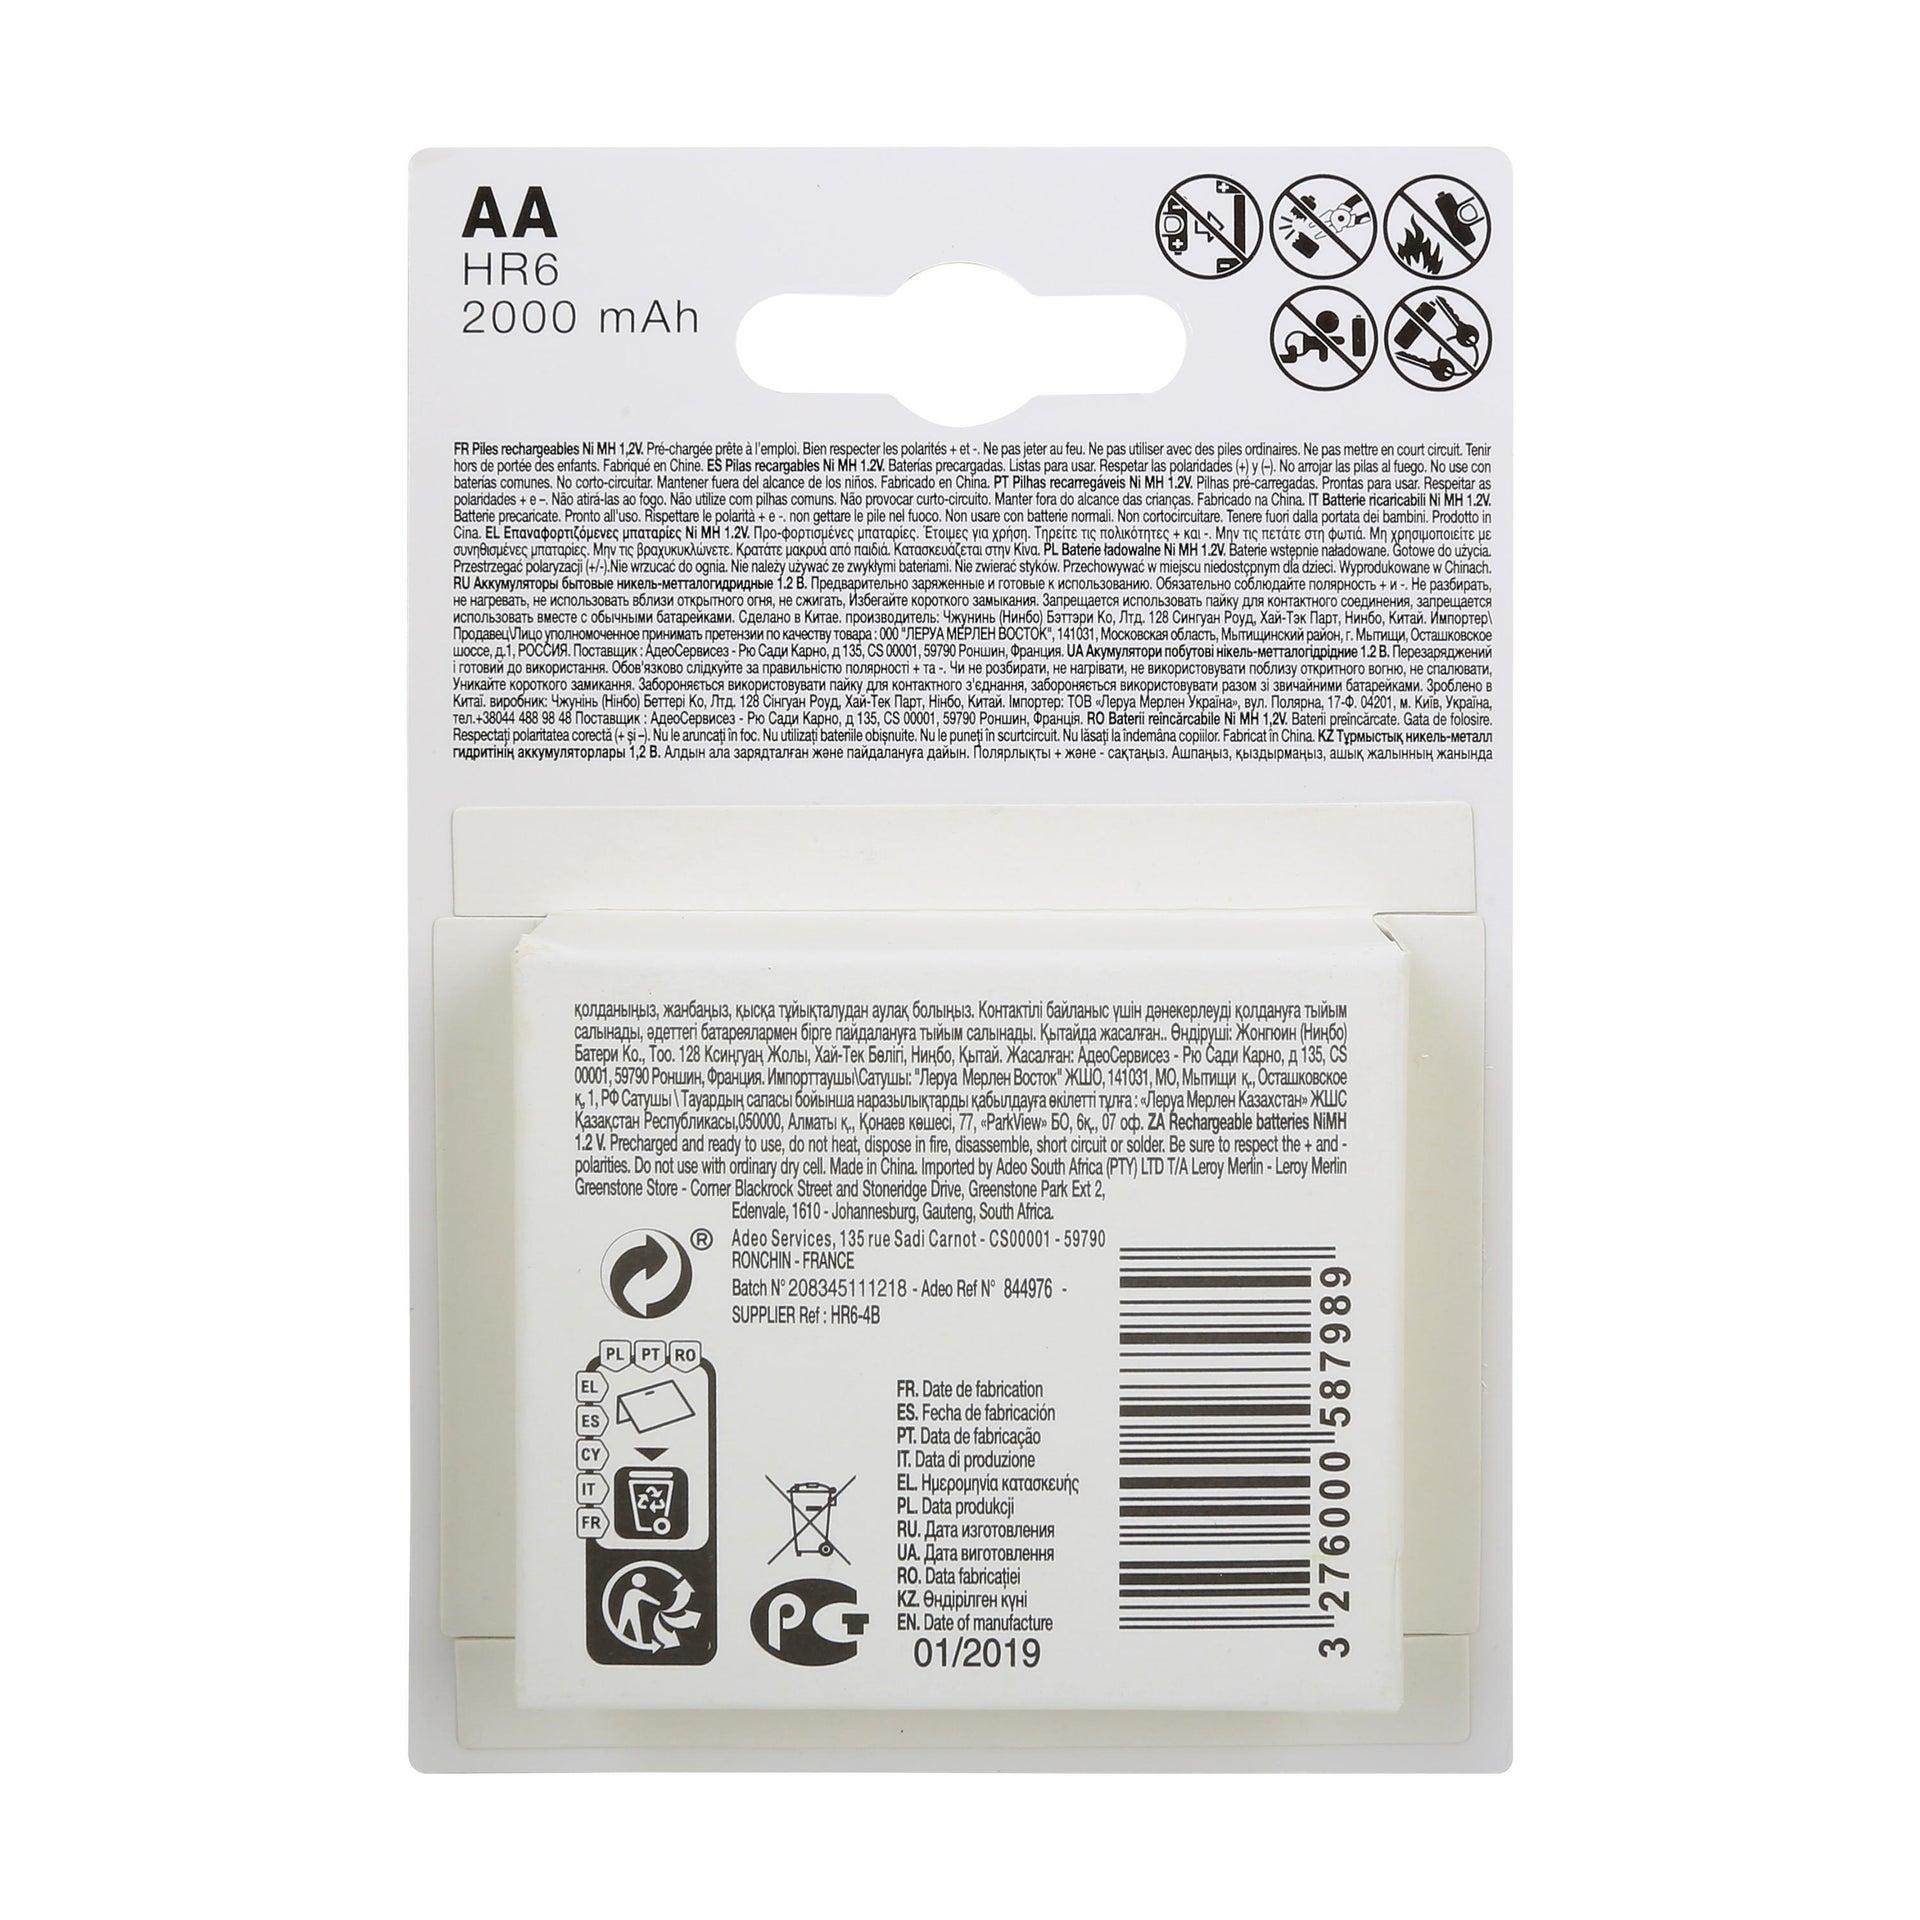 Pila ricaricabile HR6 LEXMAN 844976 4 batterie - 4